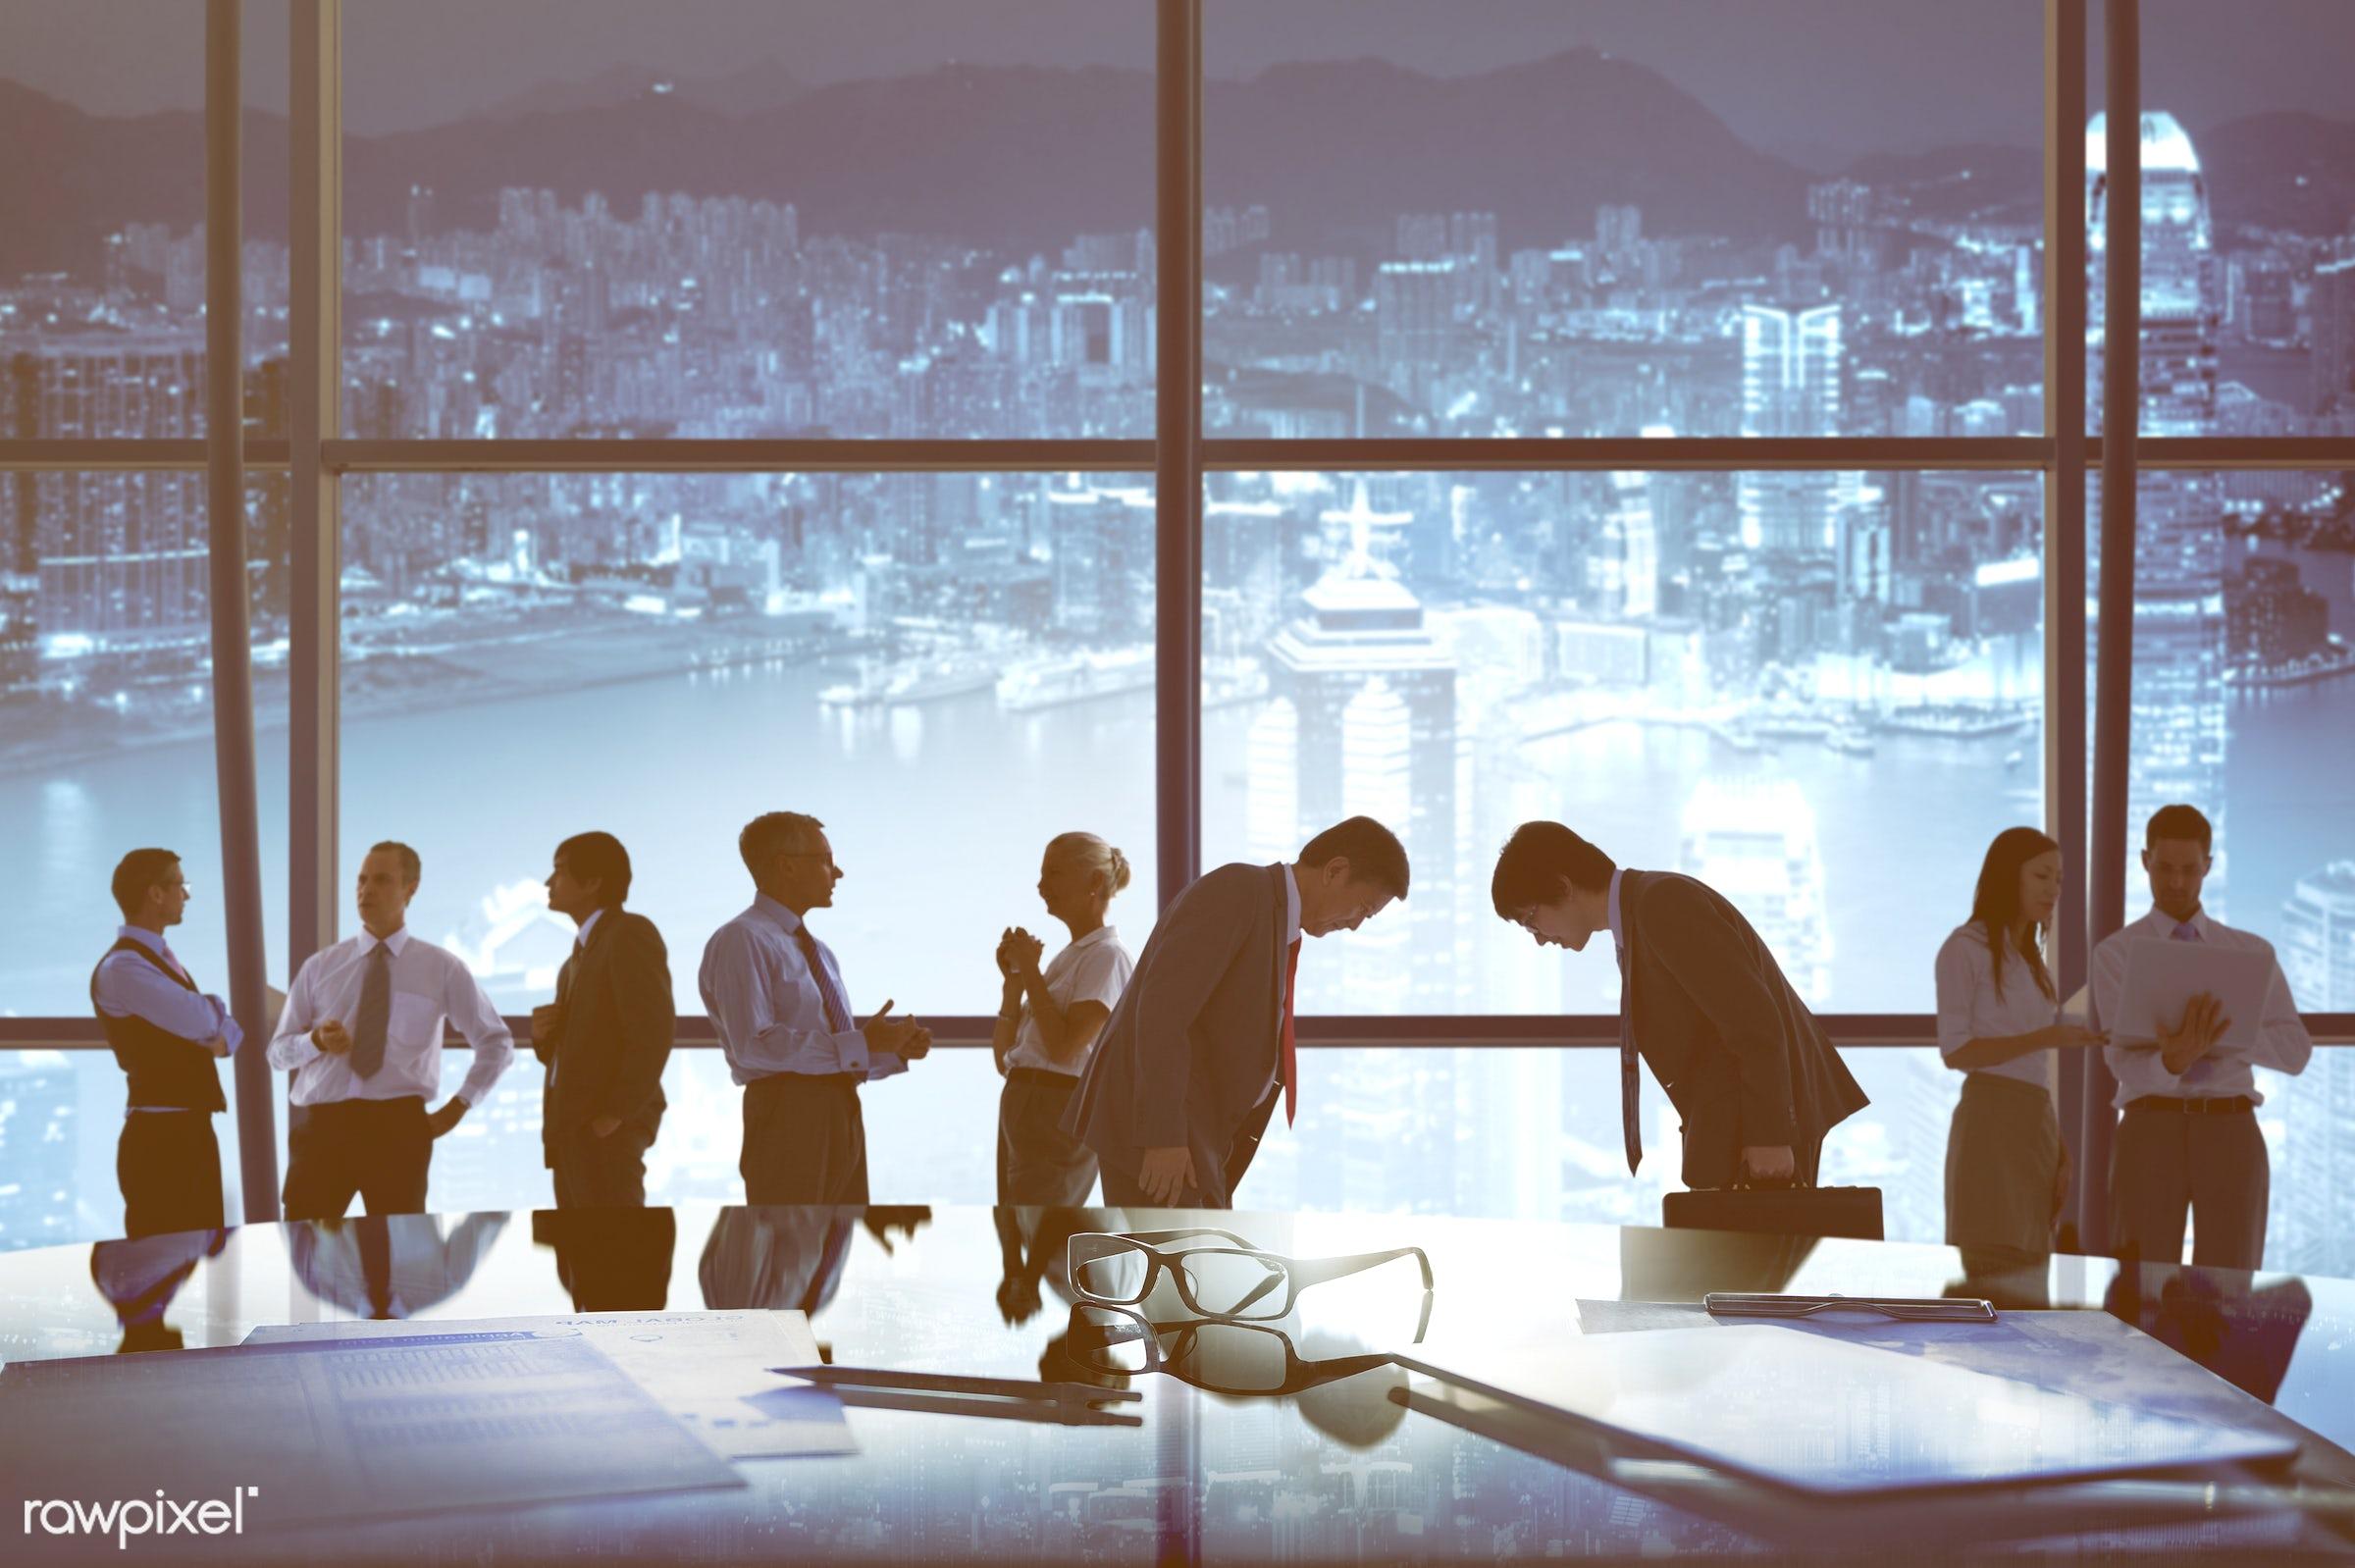 advice, agreement, backlit, board room, bowing, brainstorming, buildings, business, business people, businessmen,...